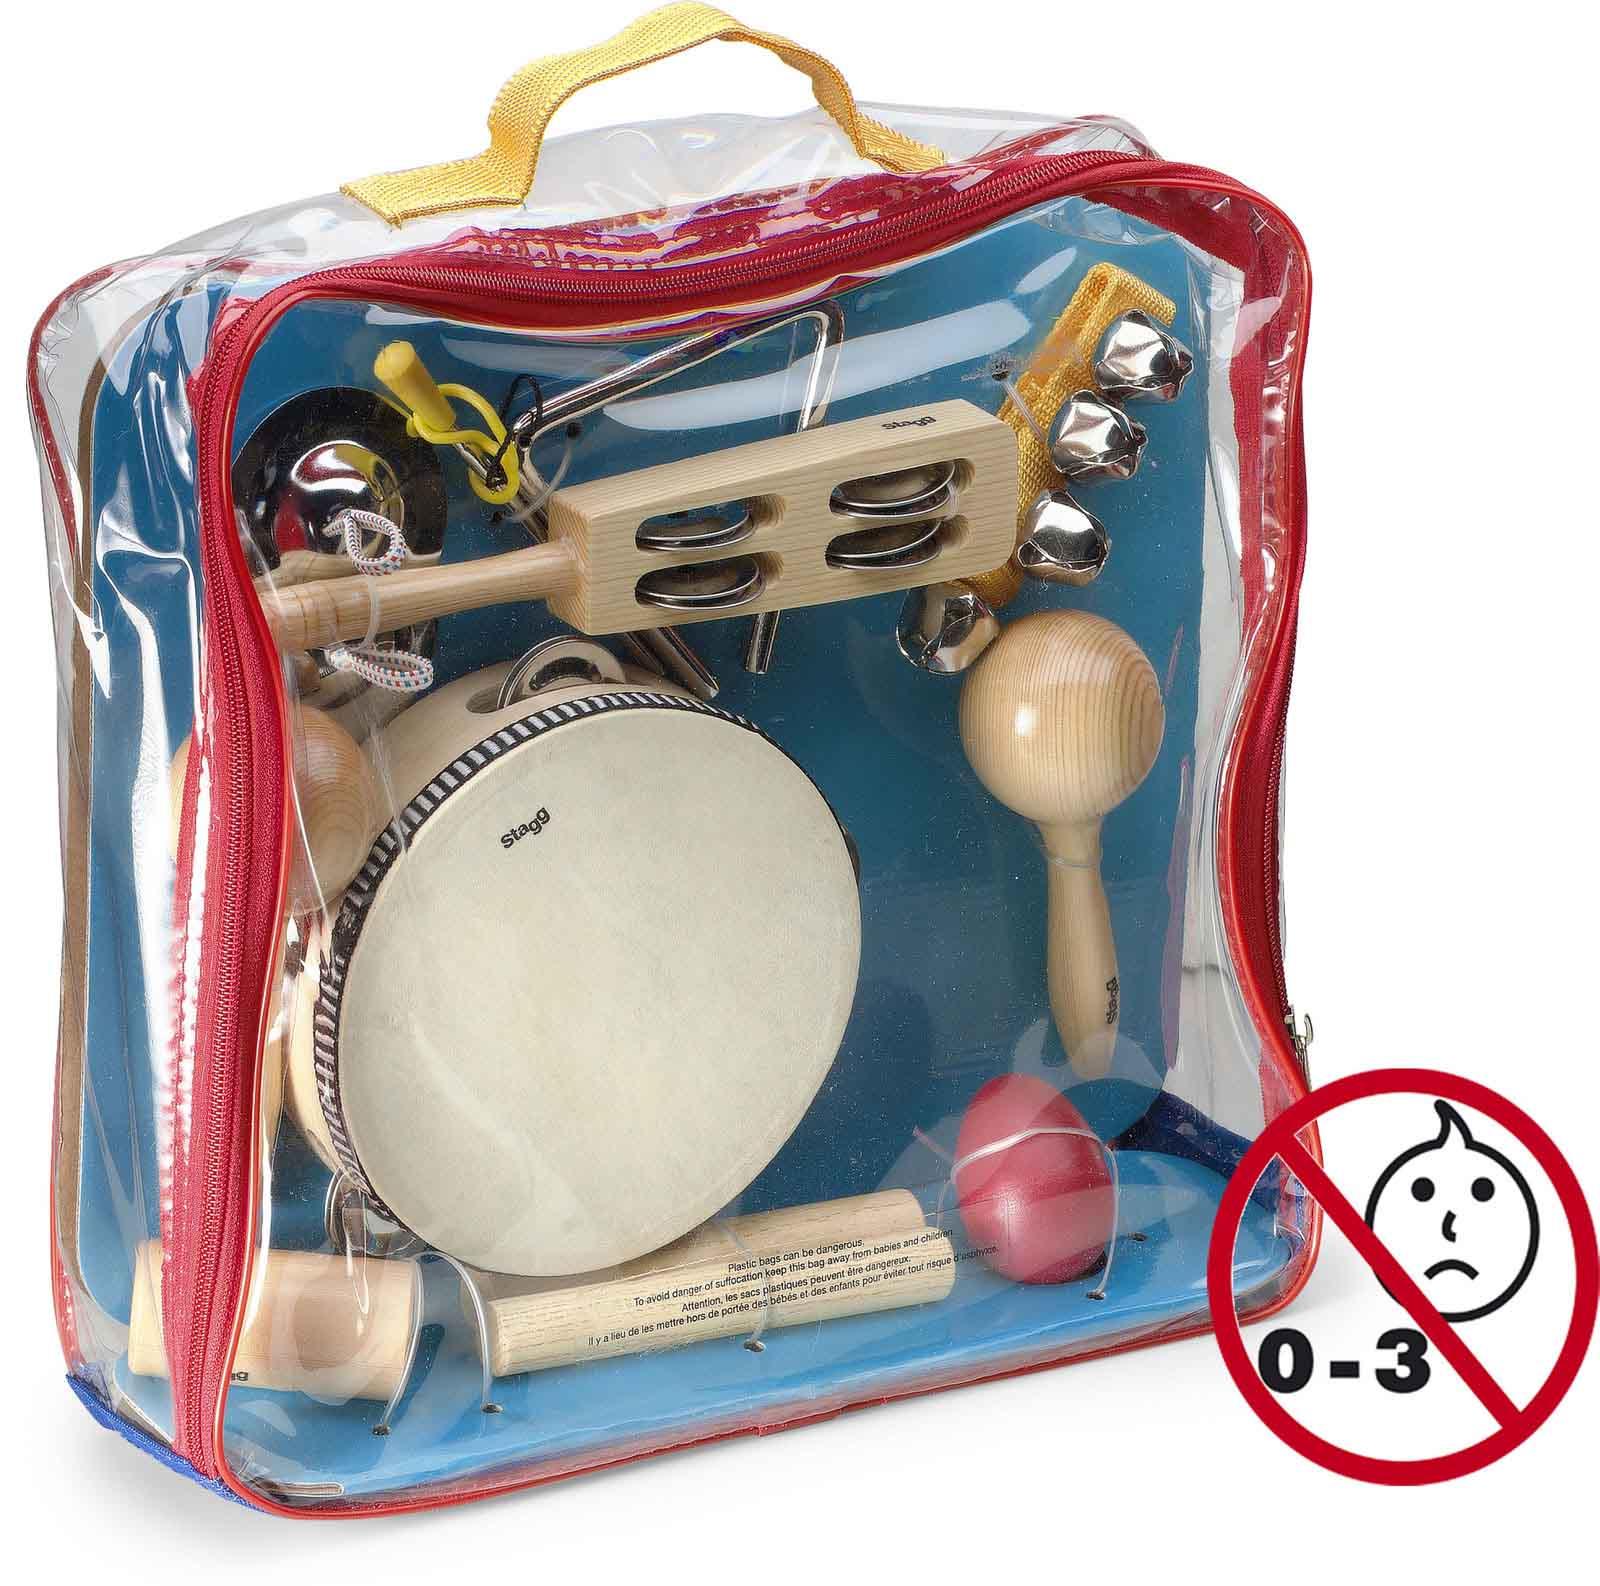 Stagg Sac De Petites Percussions